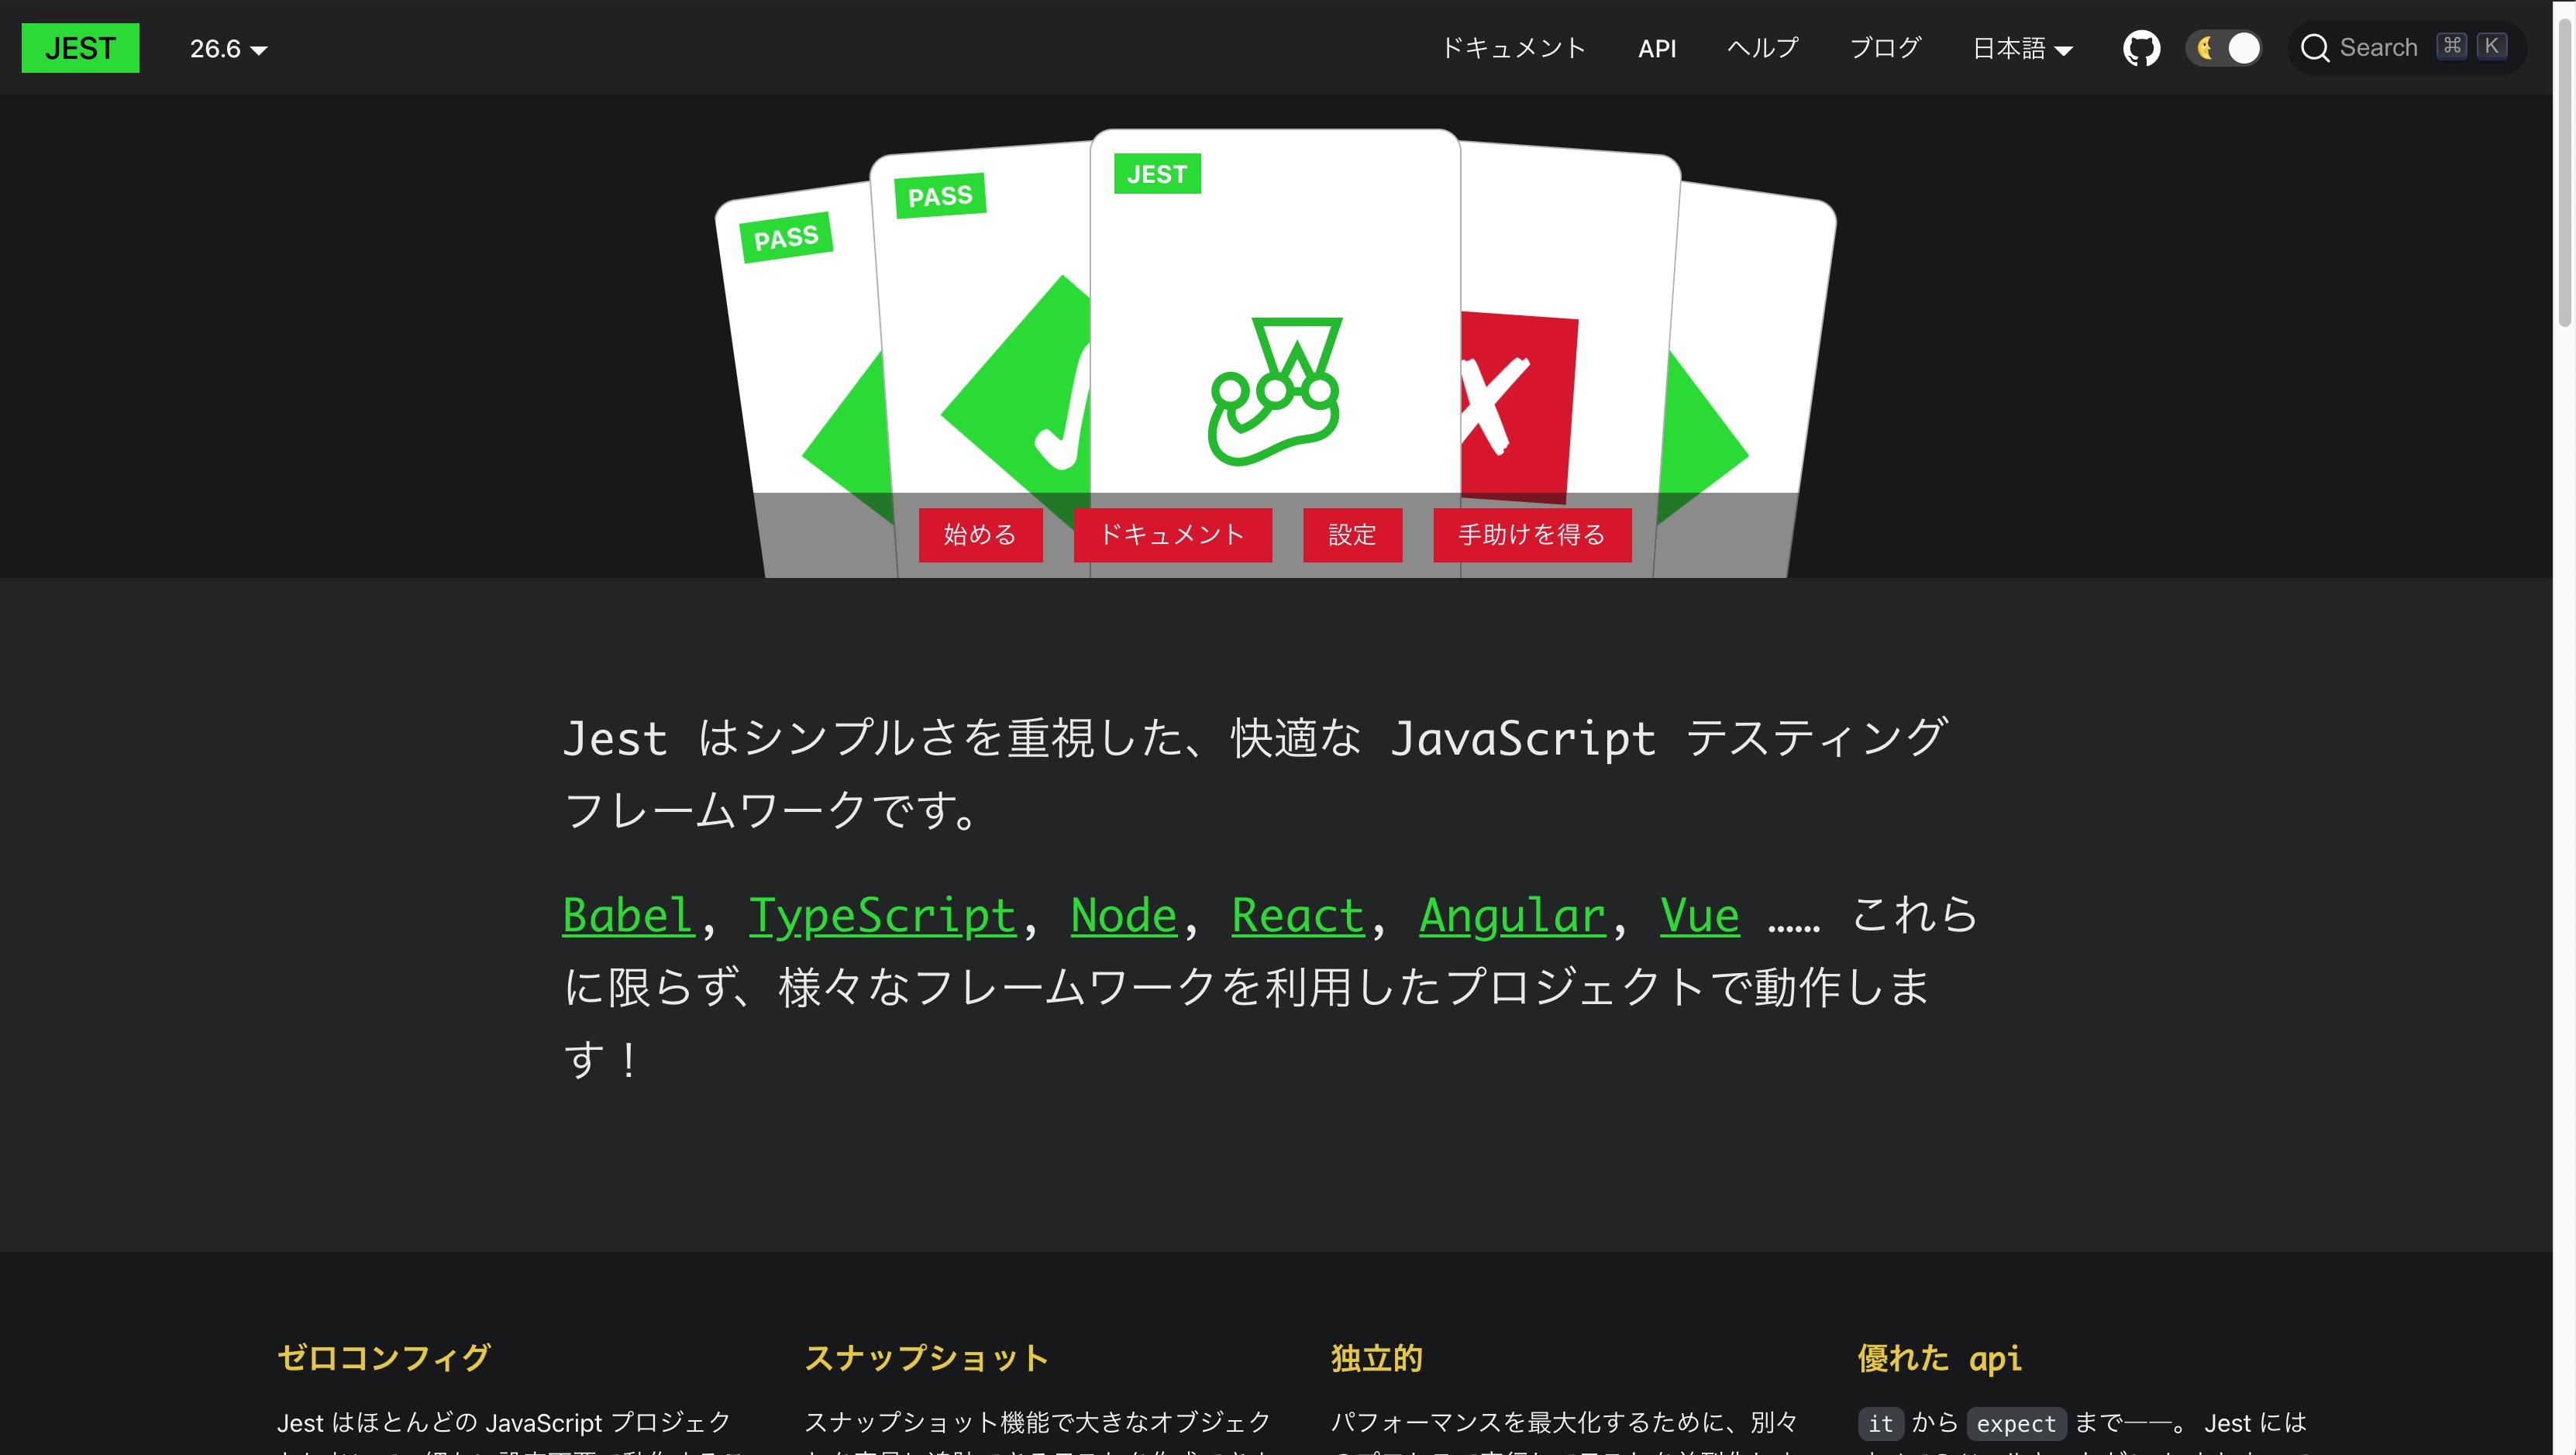 Jest in Japanese screenshot